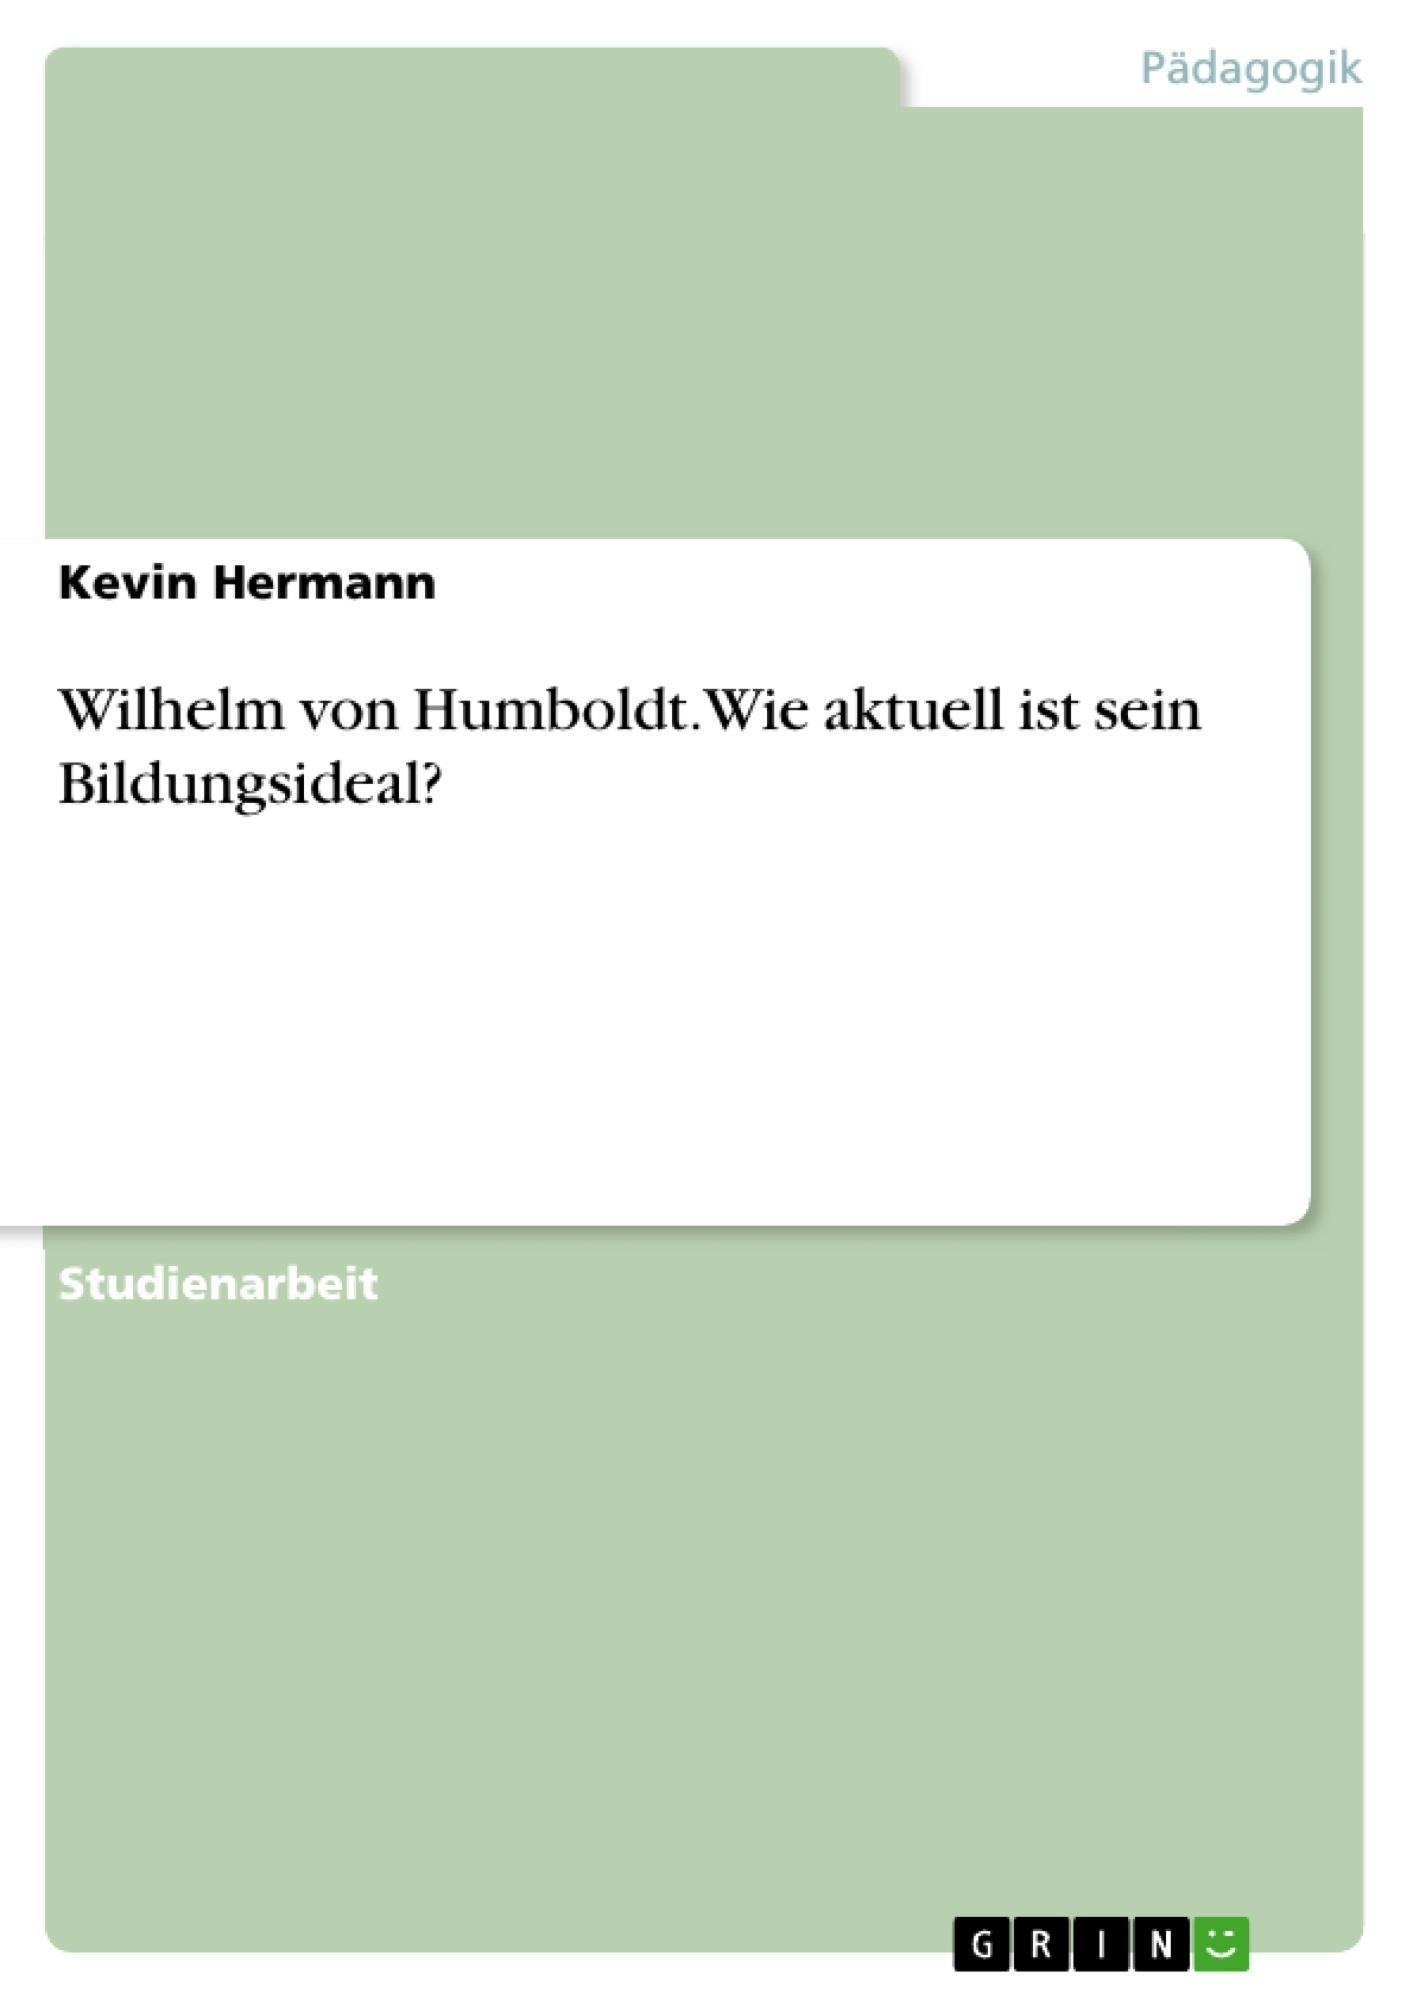 Bildungsbegriff Humboldt